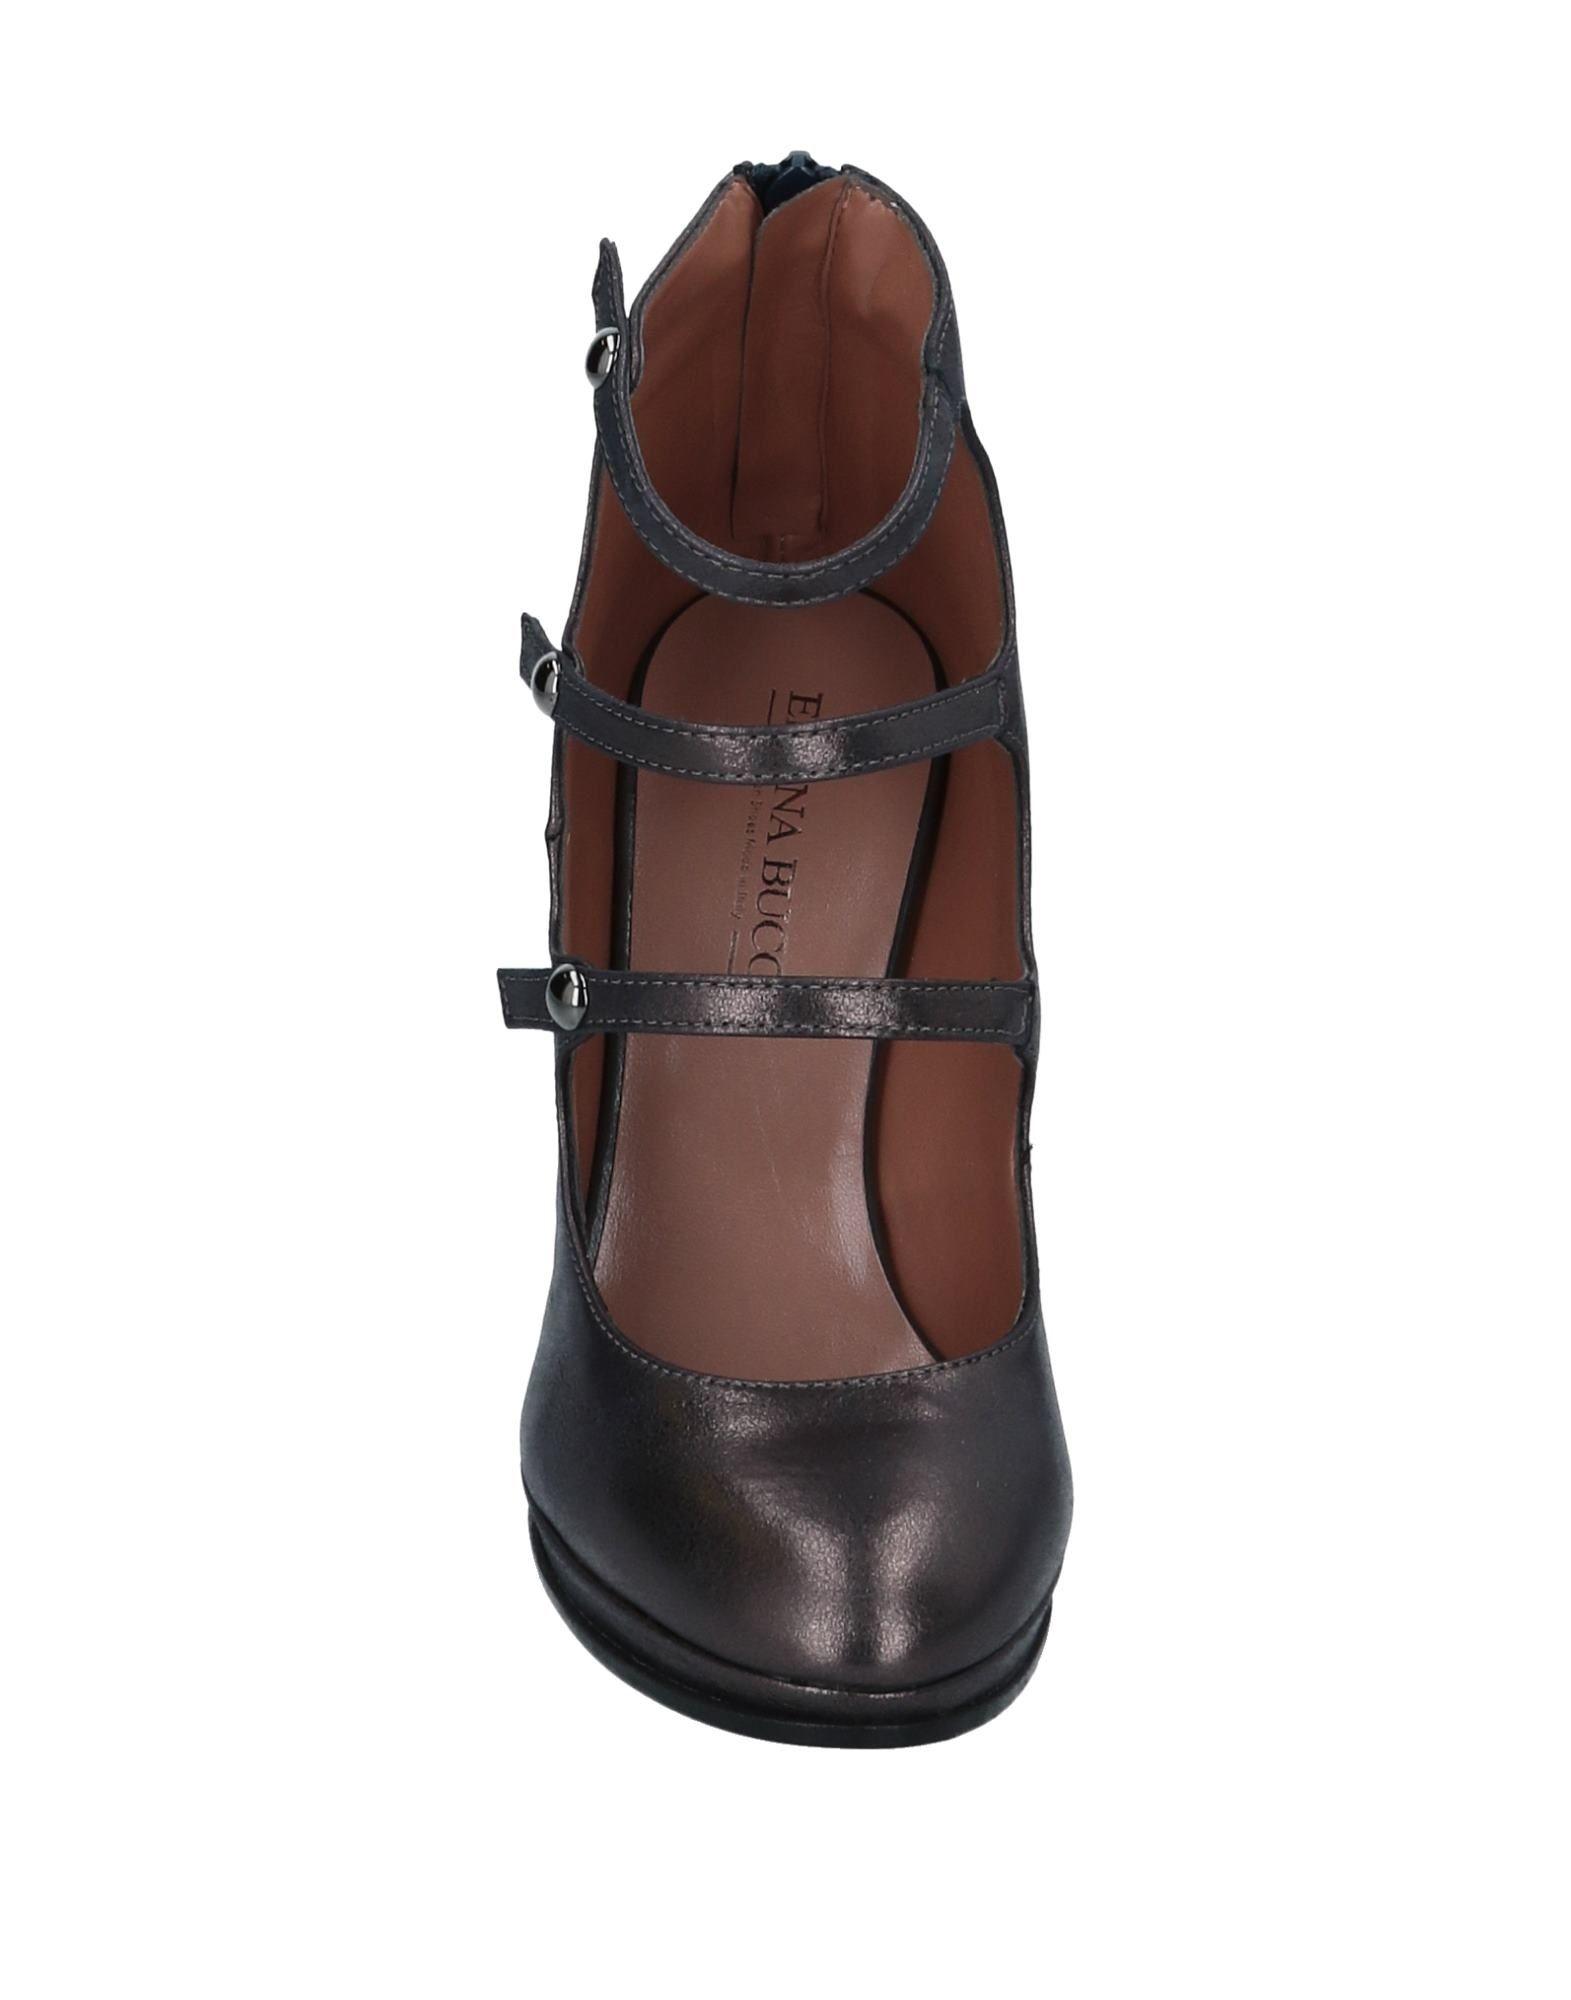 Eliana 11542579AF Bucci Stiefelette Damen  11542579AF Eliana Gute Qualität beliebte Schuhe 90aa66